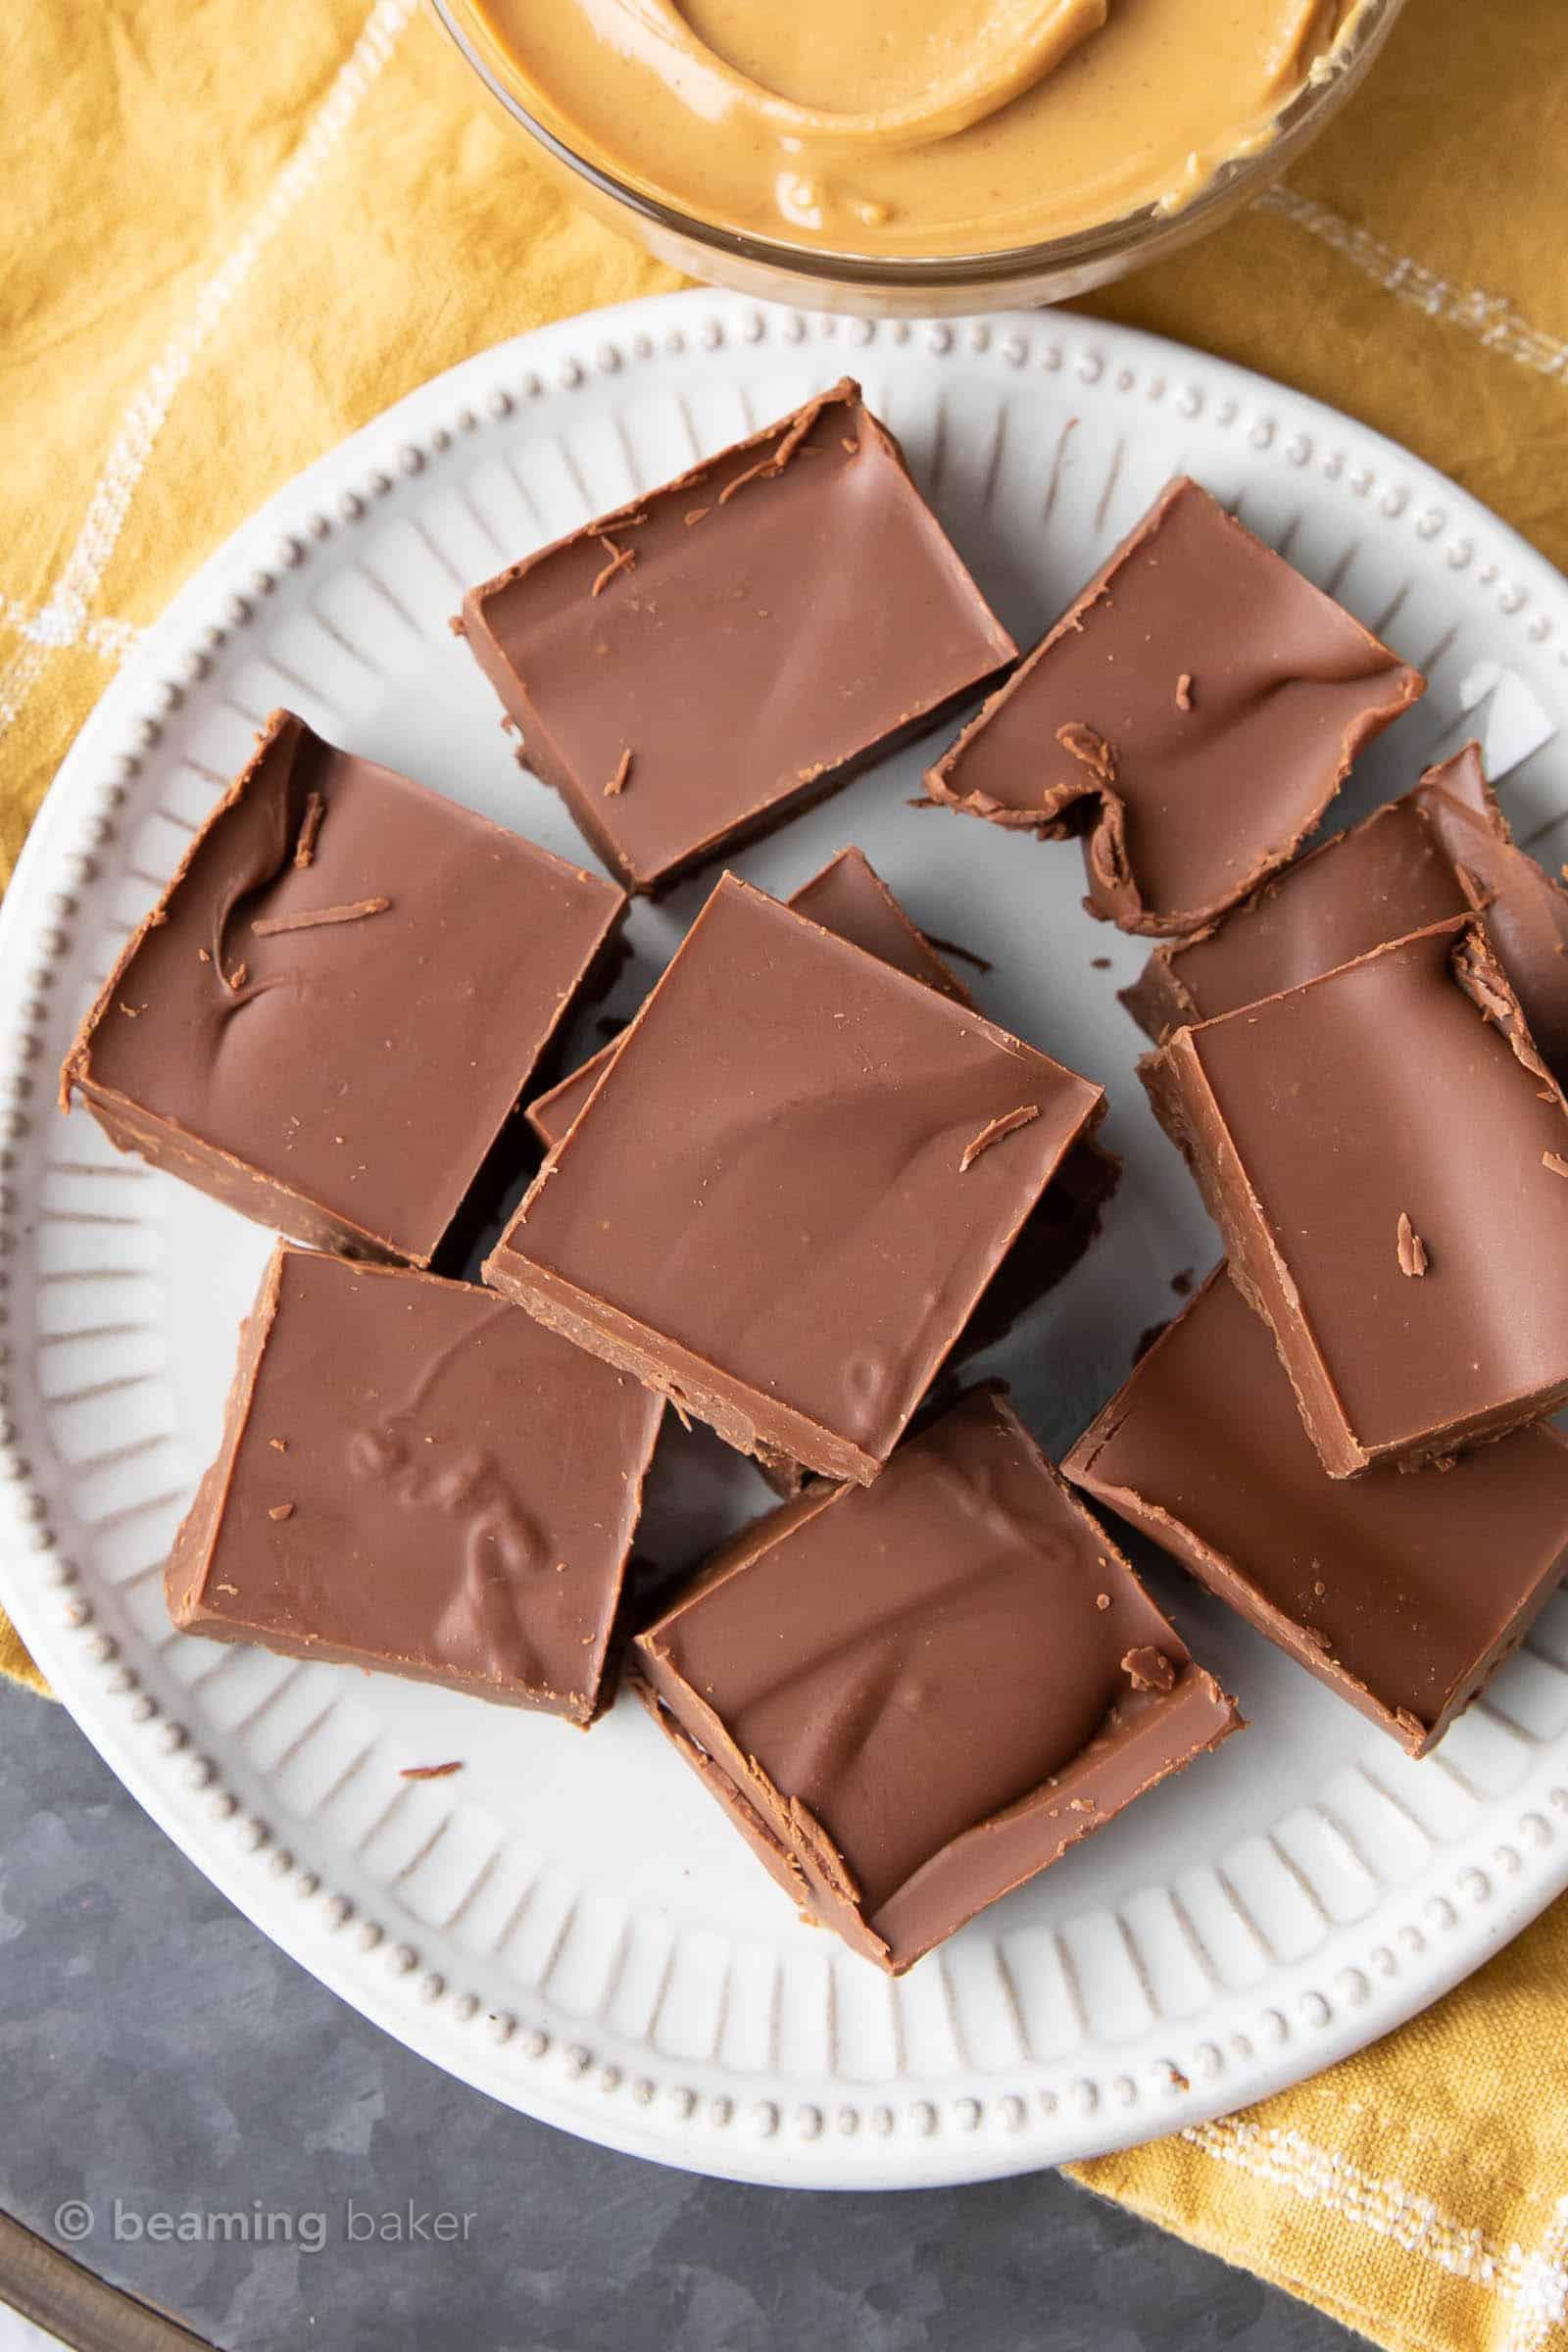 Chocolate Peanut Butter Vegan Fudge: this 2 ingredient EASY vegan fudge recipe yields thick squares of decadent, rich fudge that tastes like peanut butter cups! #Vegan #Chocolate #PeanutButter #Fudge | Recipe at BeamingBaker.com